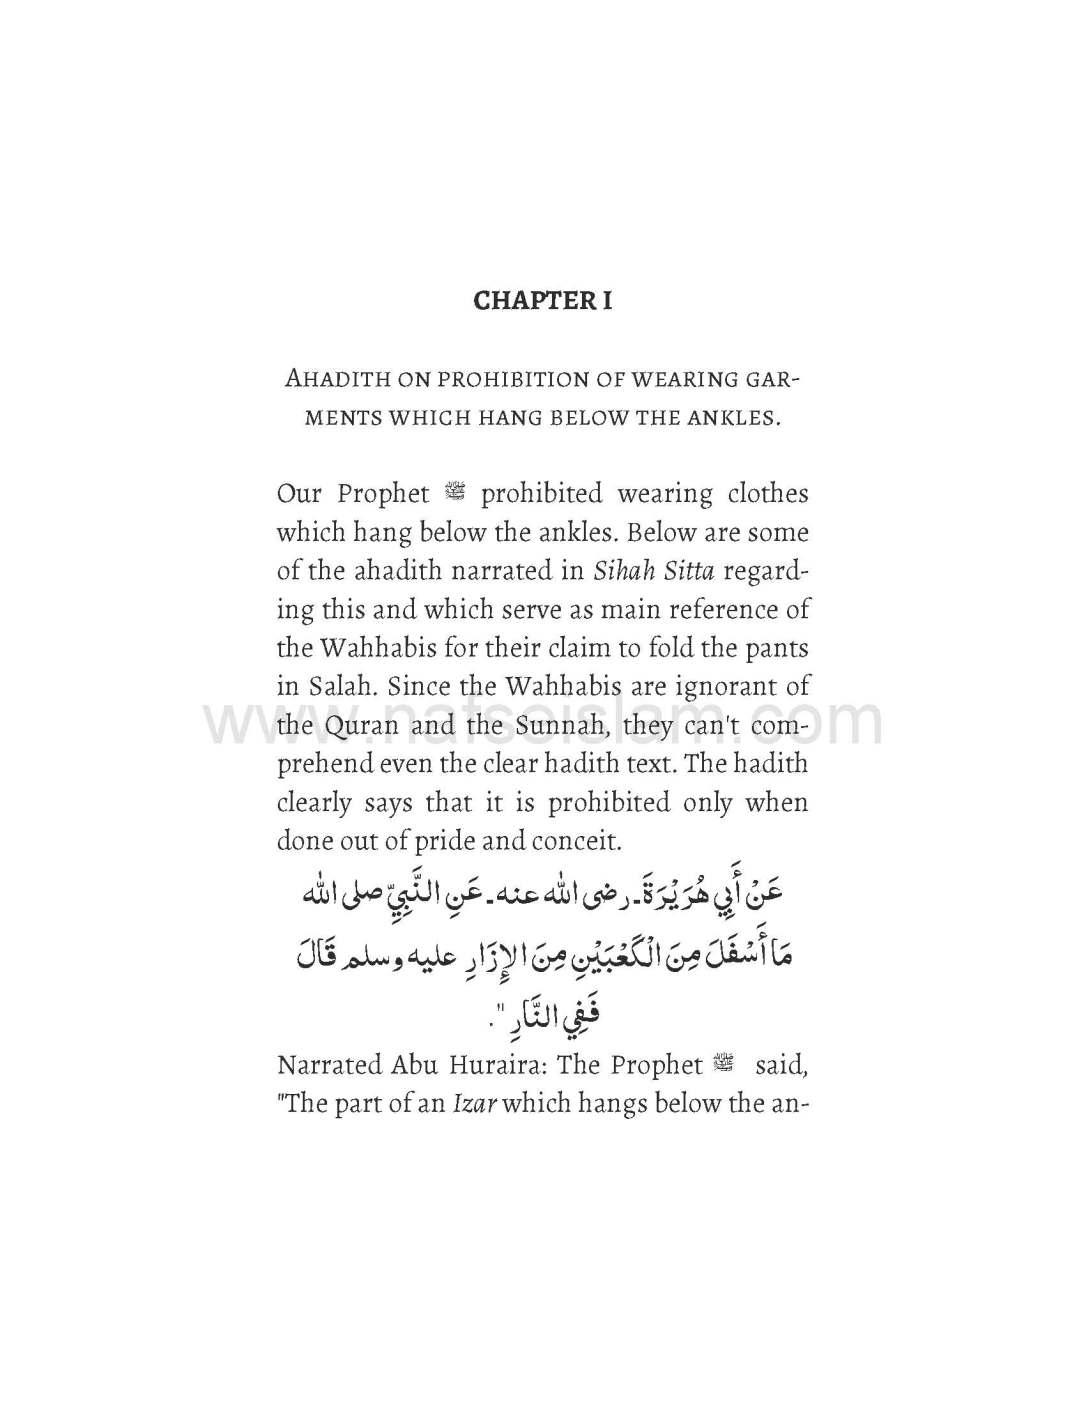 Islamic Ruling On Folding Pants In Salah_Page_03